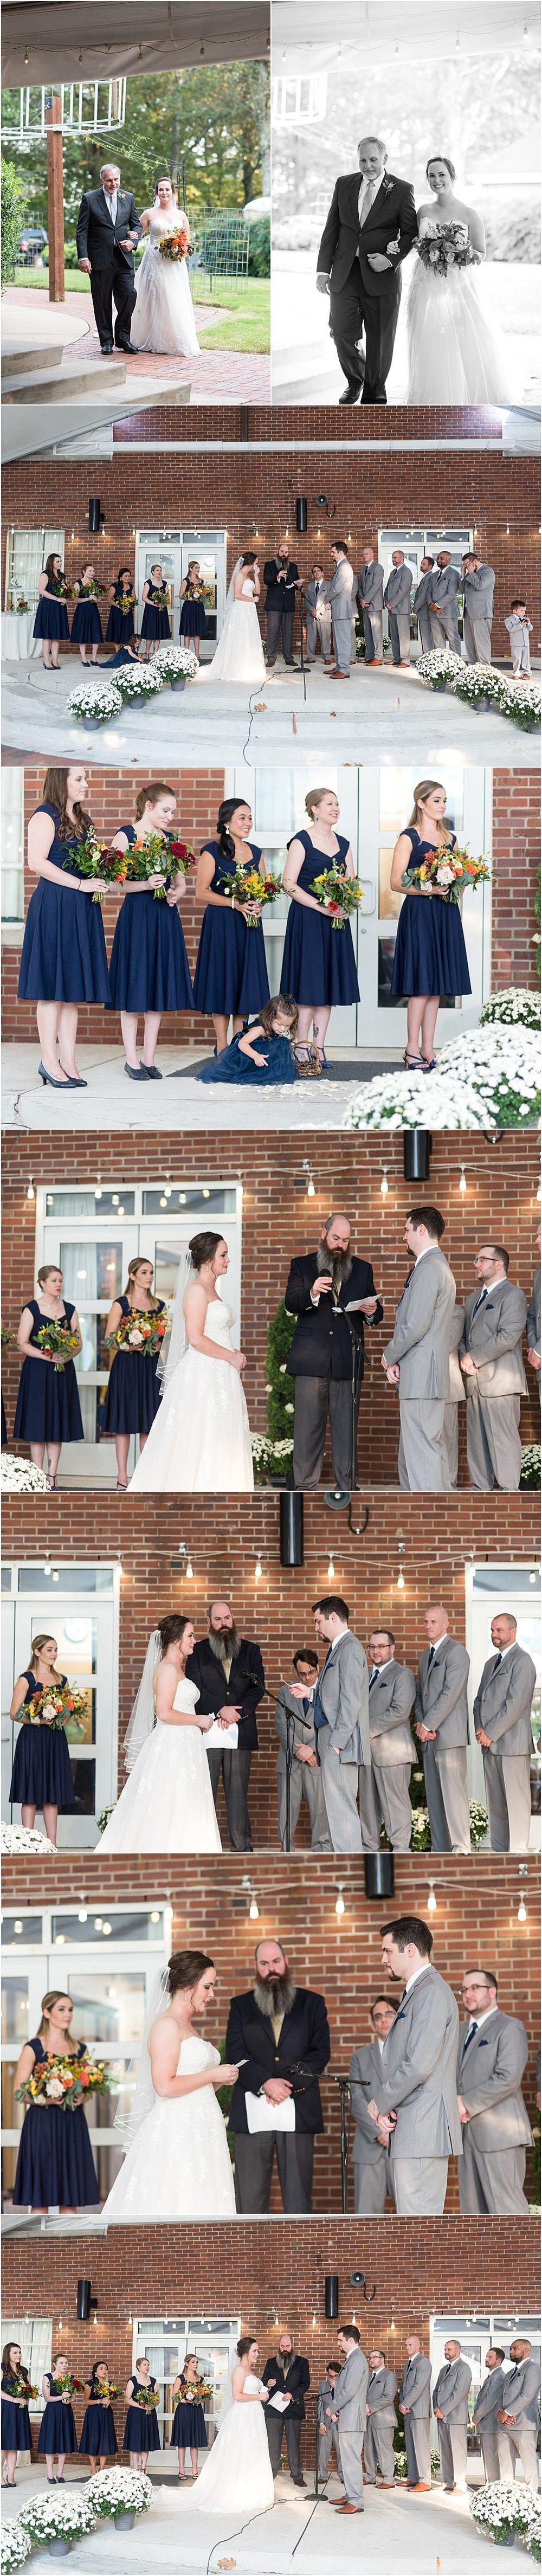 Nolan-And-Leanna-Vanderbilt-Dyer-Observatory-Wedding-in-Brentwood-TN-Nashville-Wedding-Photographers+6